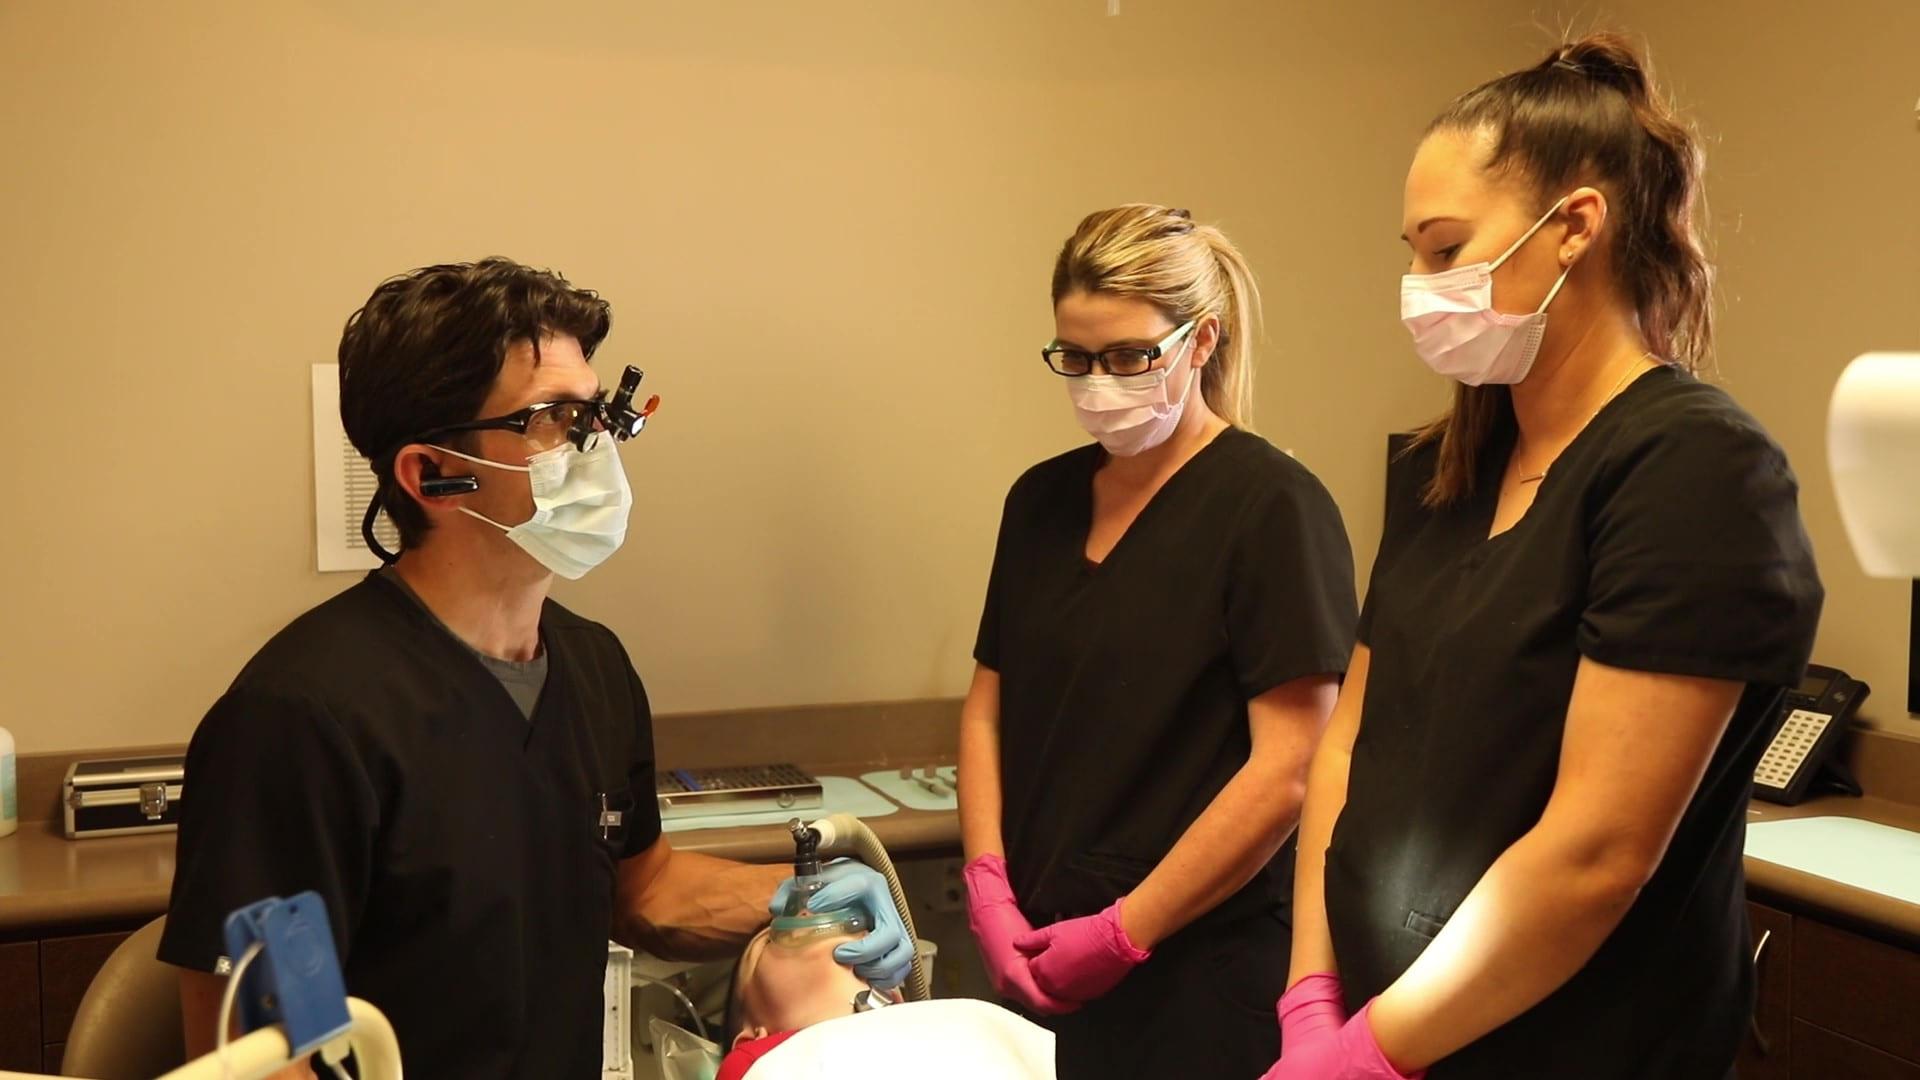 sedation-dentist-in-california-dr-david-crippen-capital-pediatric-dentistry